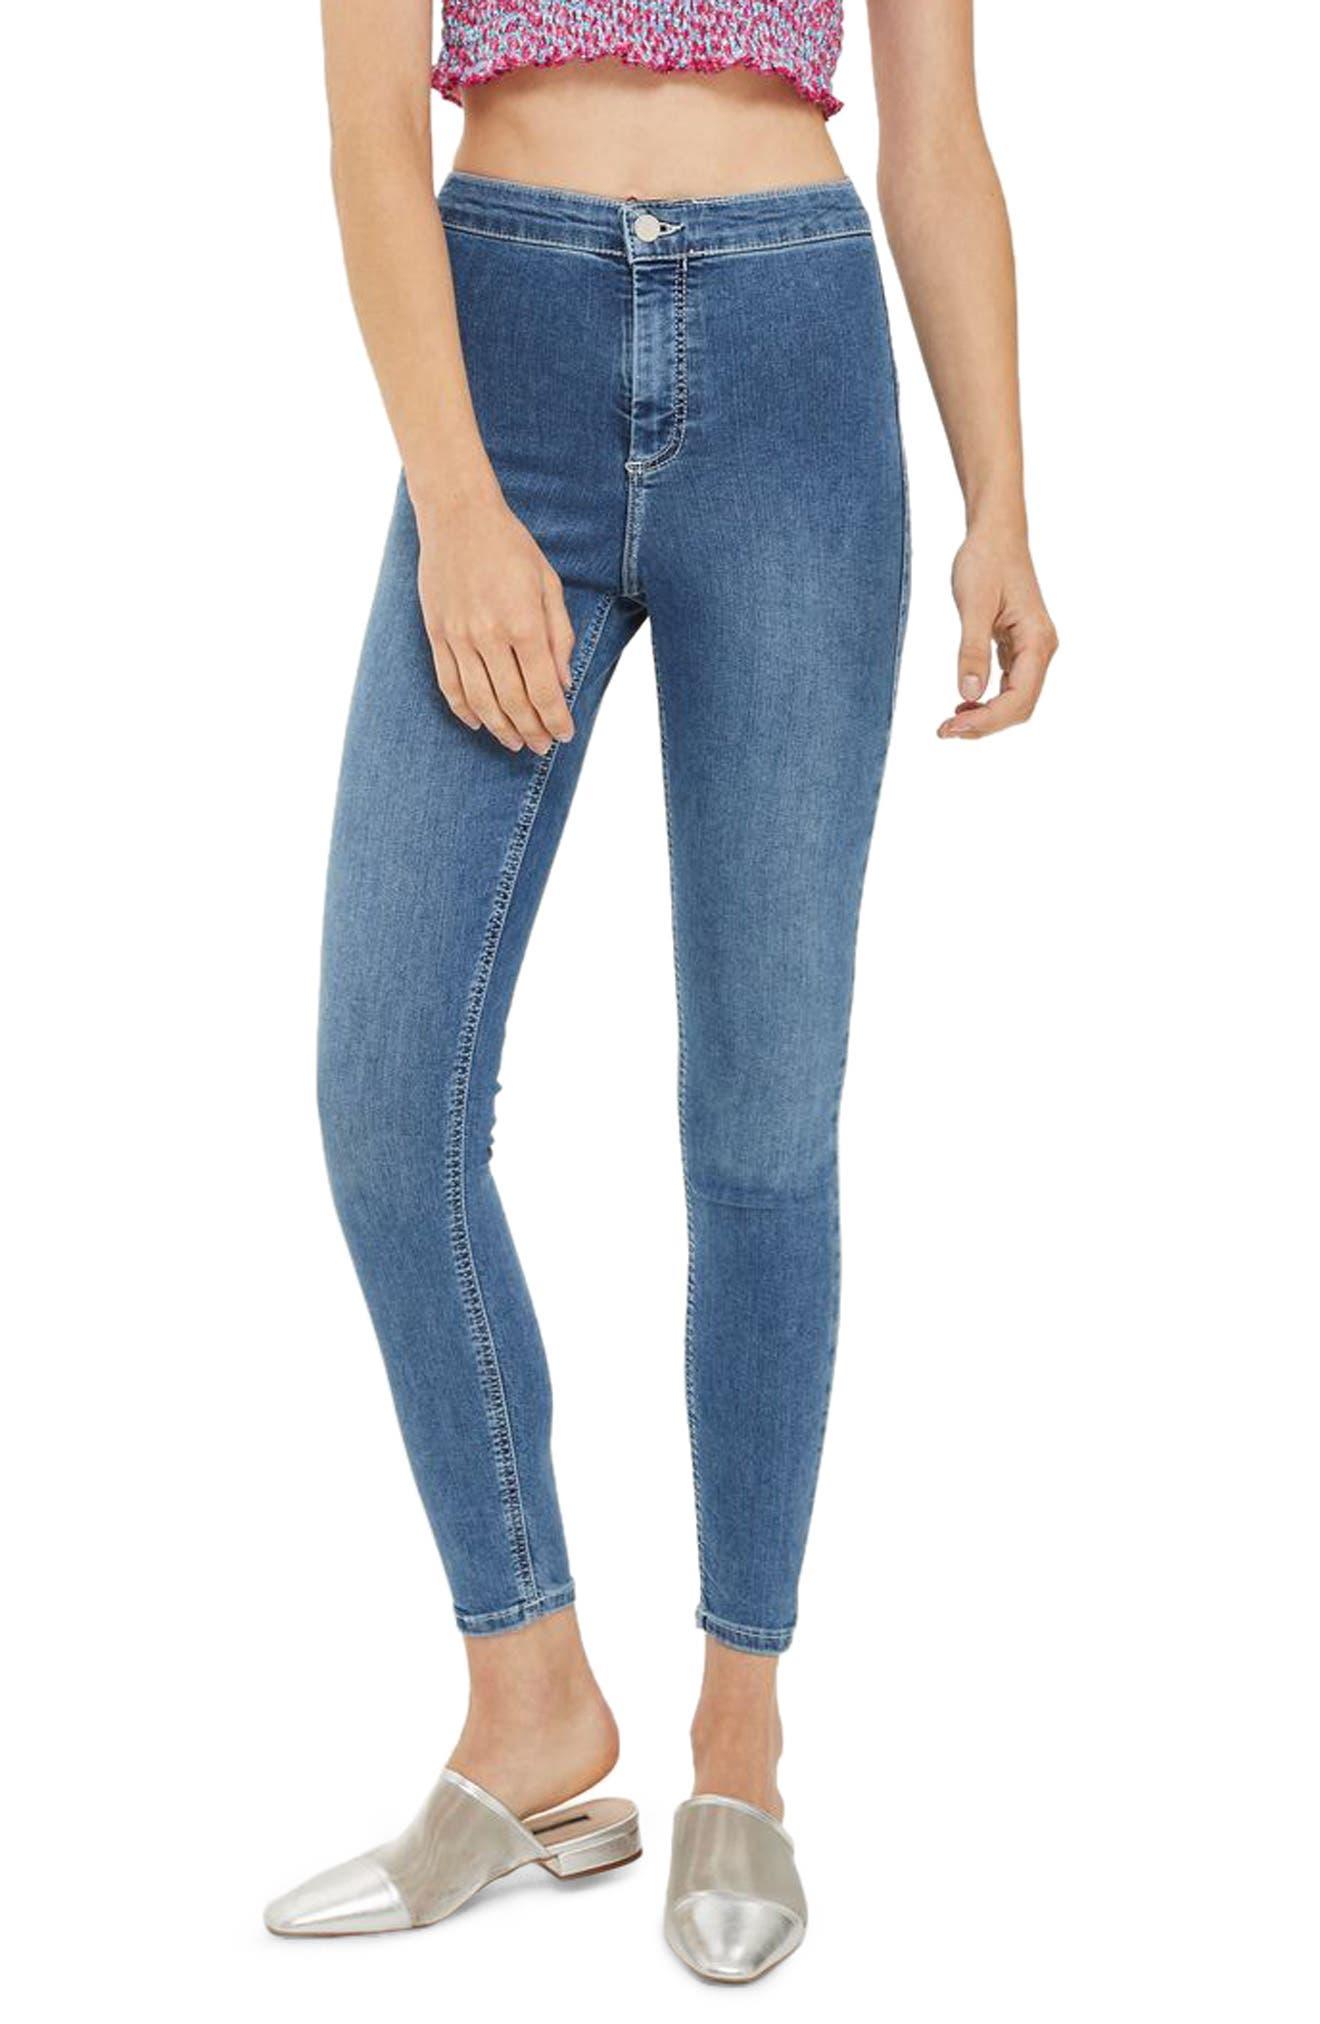 Main Image - Topshop Joni Contrast Stitch High Rise Skinny Jeans